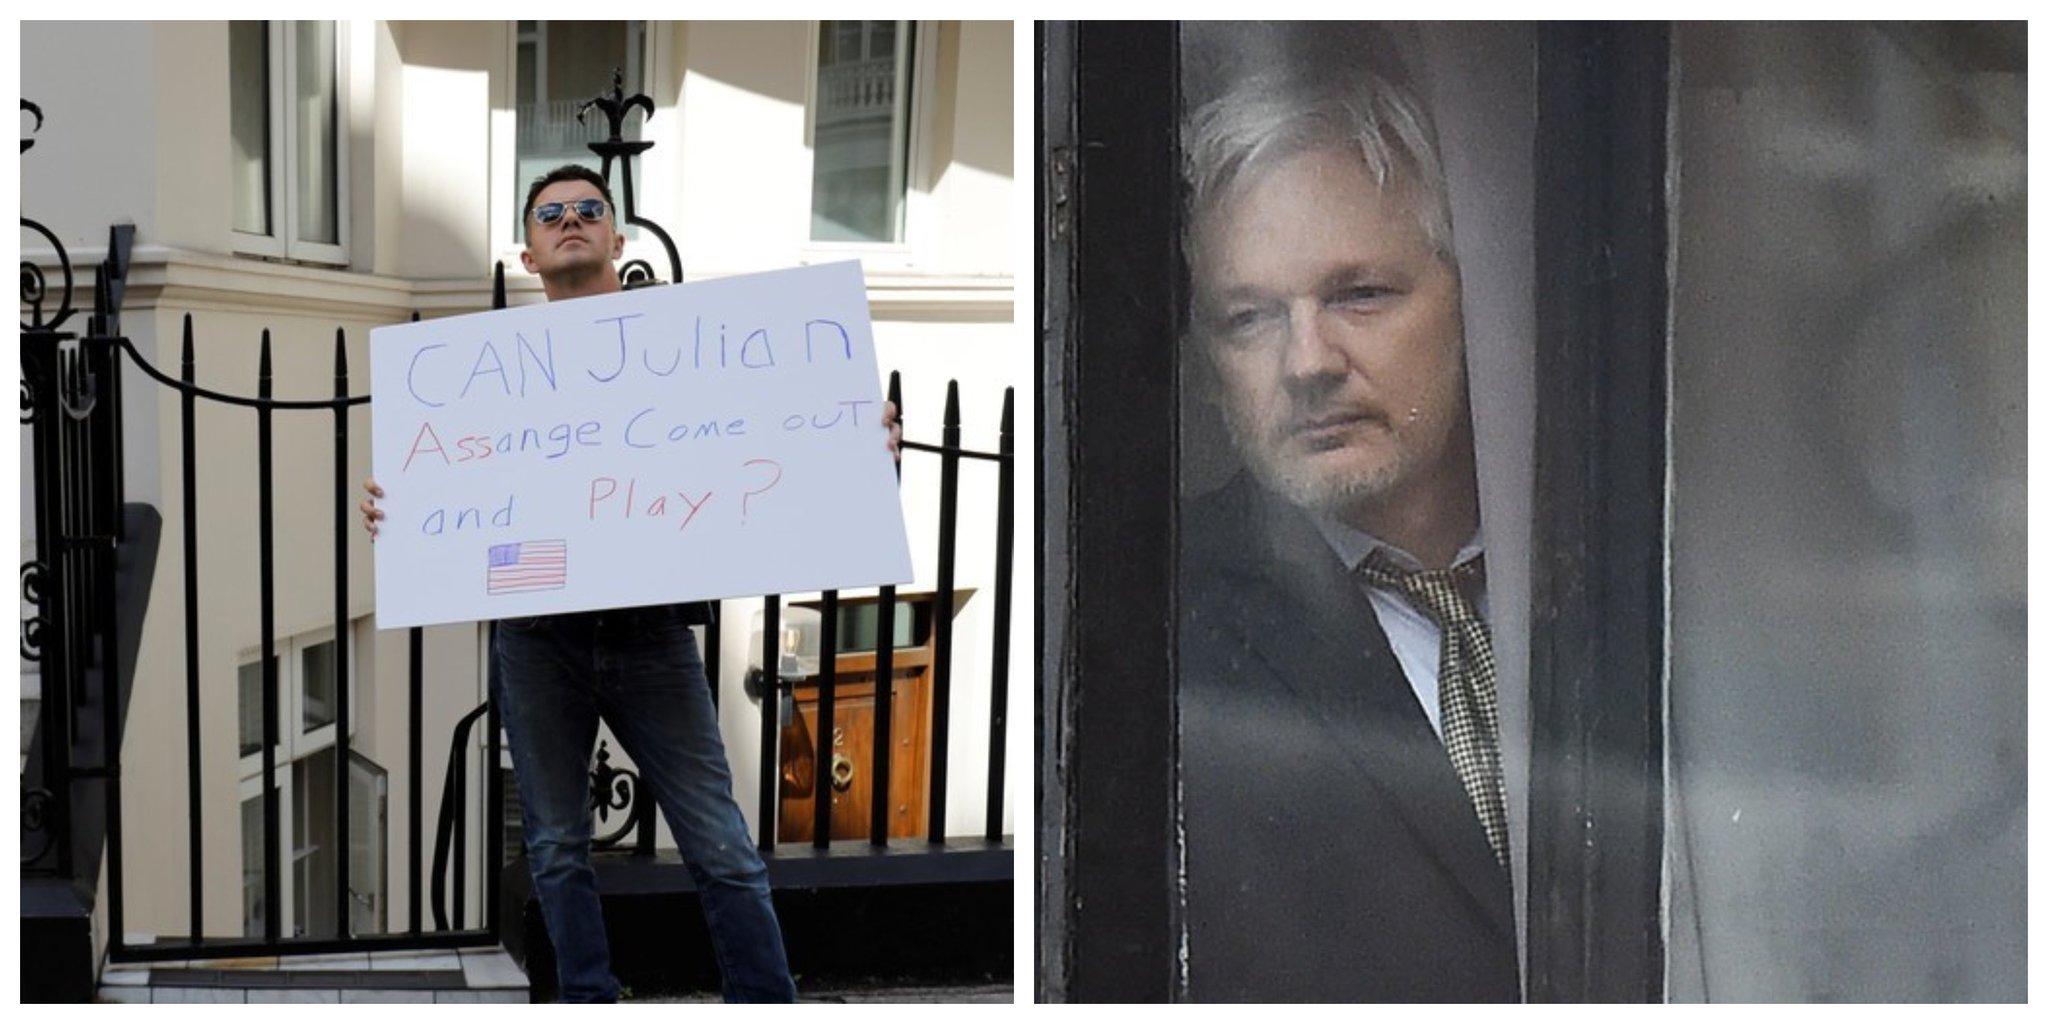 'Special designation'? Ecuador mulled sending Assange as a diplomat to Russia - report   https://t.co/SfNWLLeO9j https://t.co/9viVcEQJWy